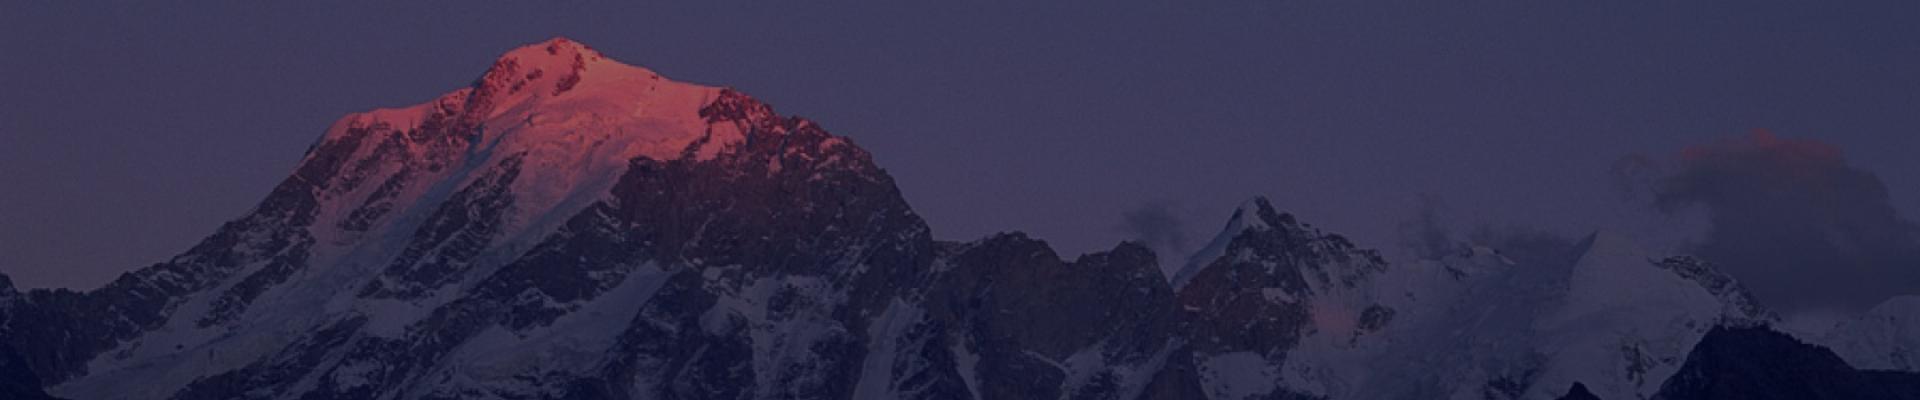 Adventure things to do in McLeodganj, Himachal Pradesh, India